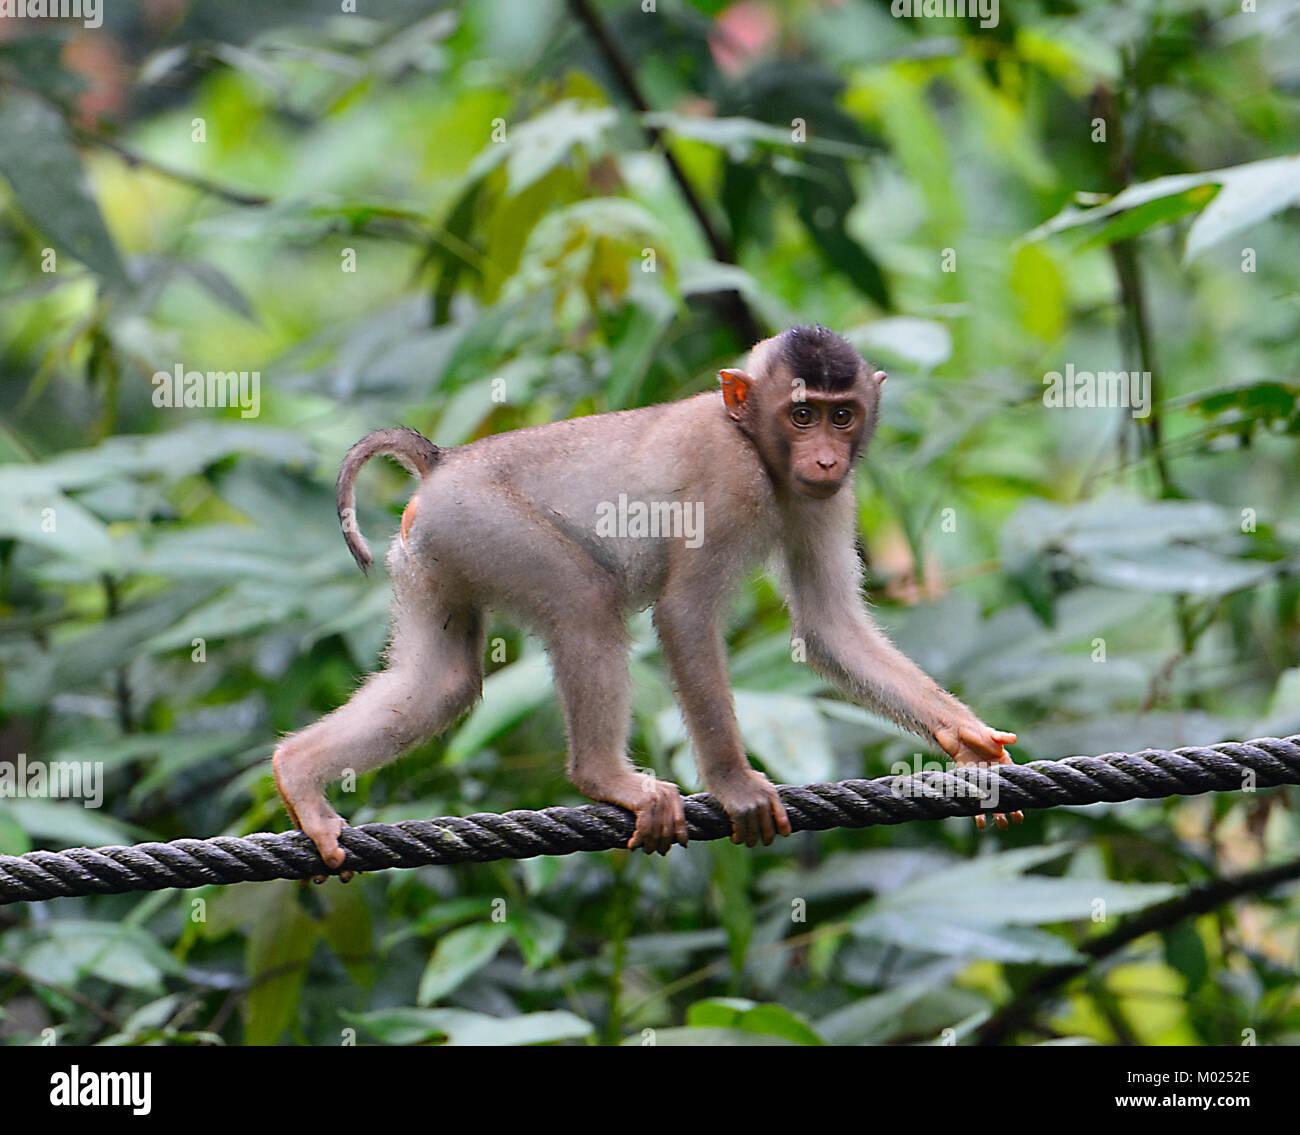 Southern Pig-coda Macaque (Macaca nemestrina), Sepilok Orangutan Centro di riabilitazione, Borneo, Sabah, Malaysia Immagini Stock